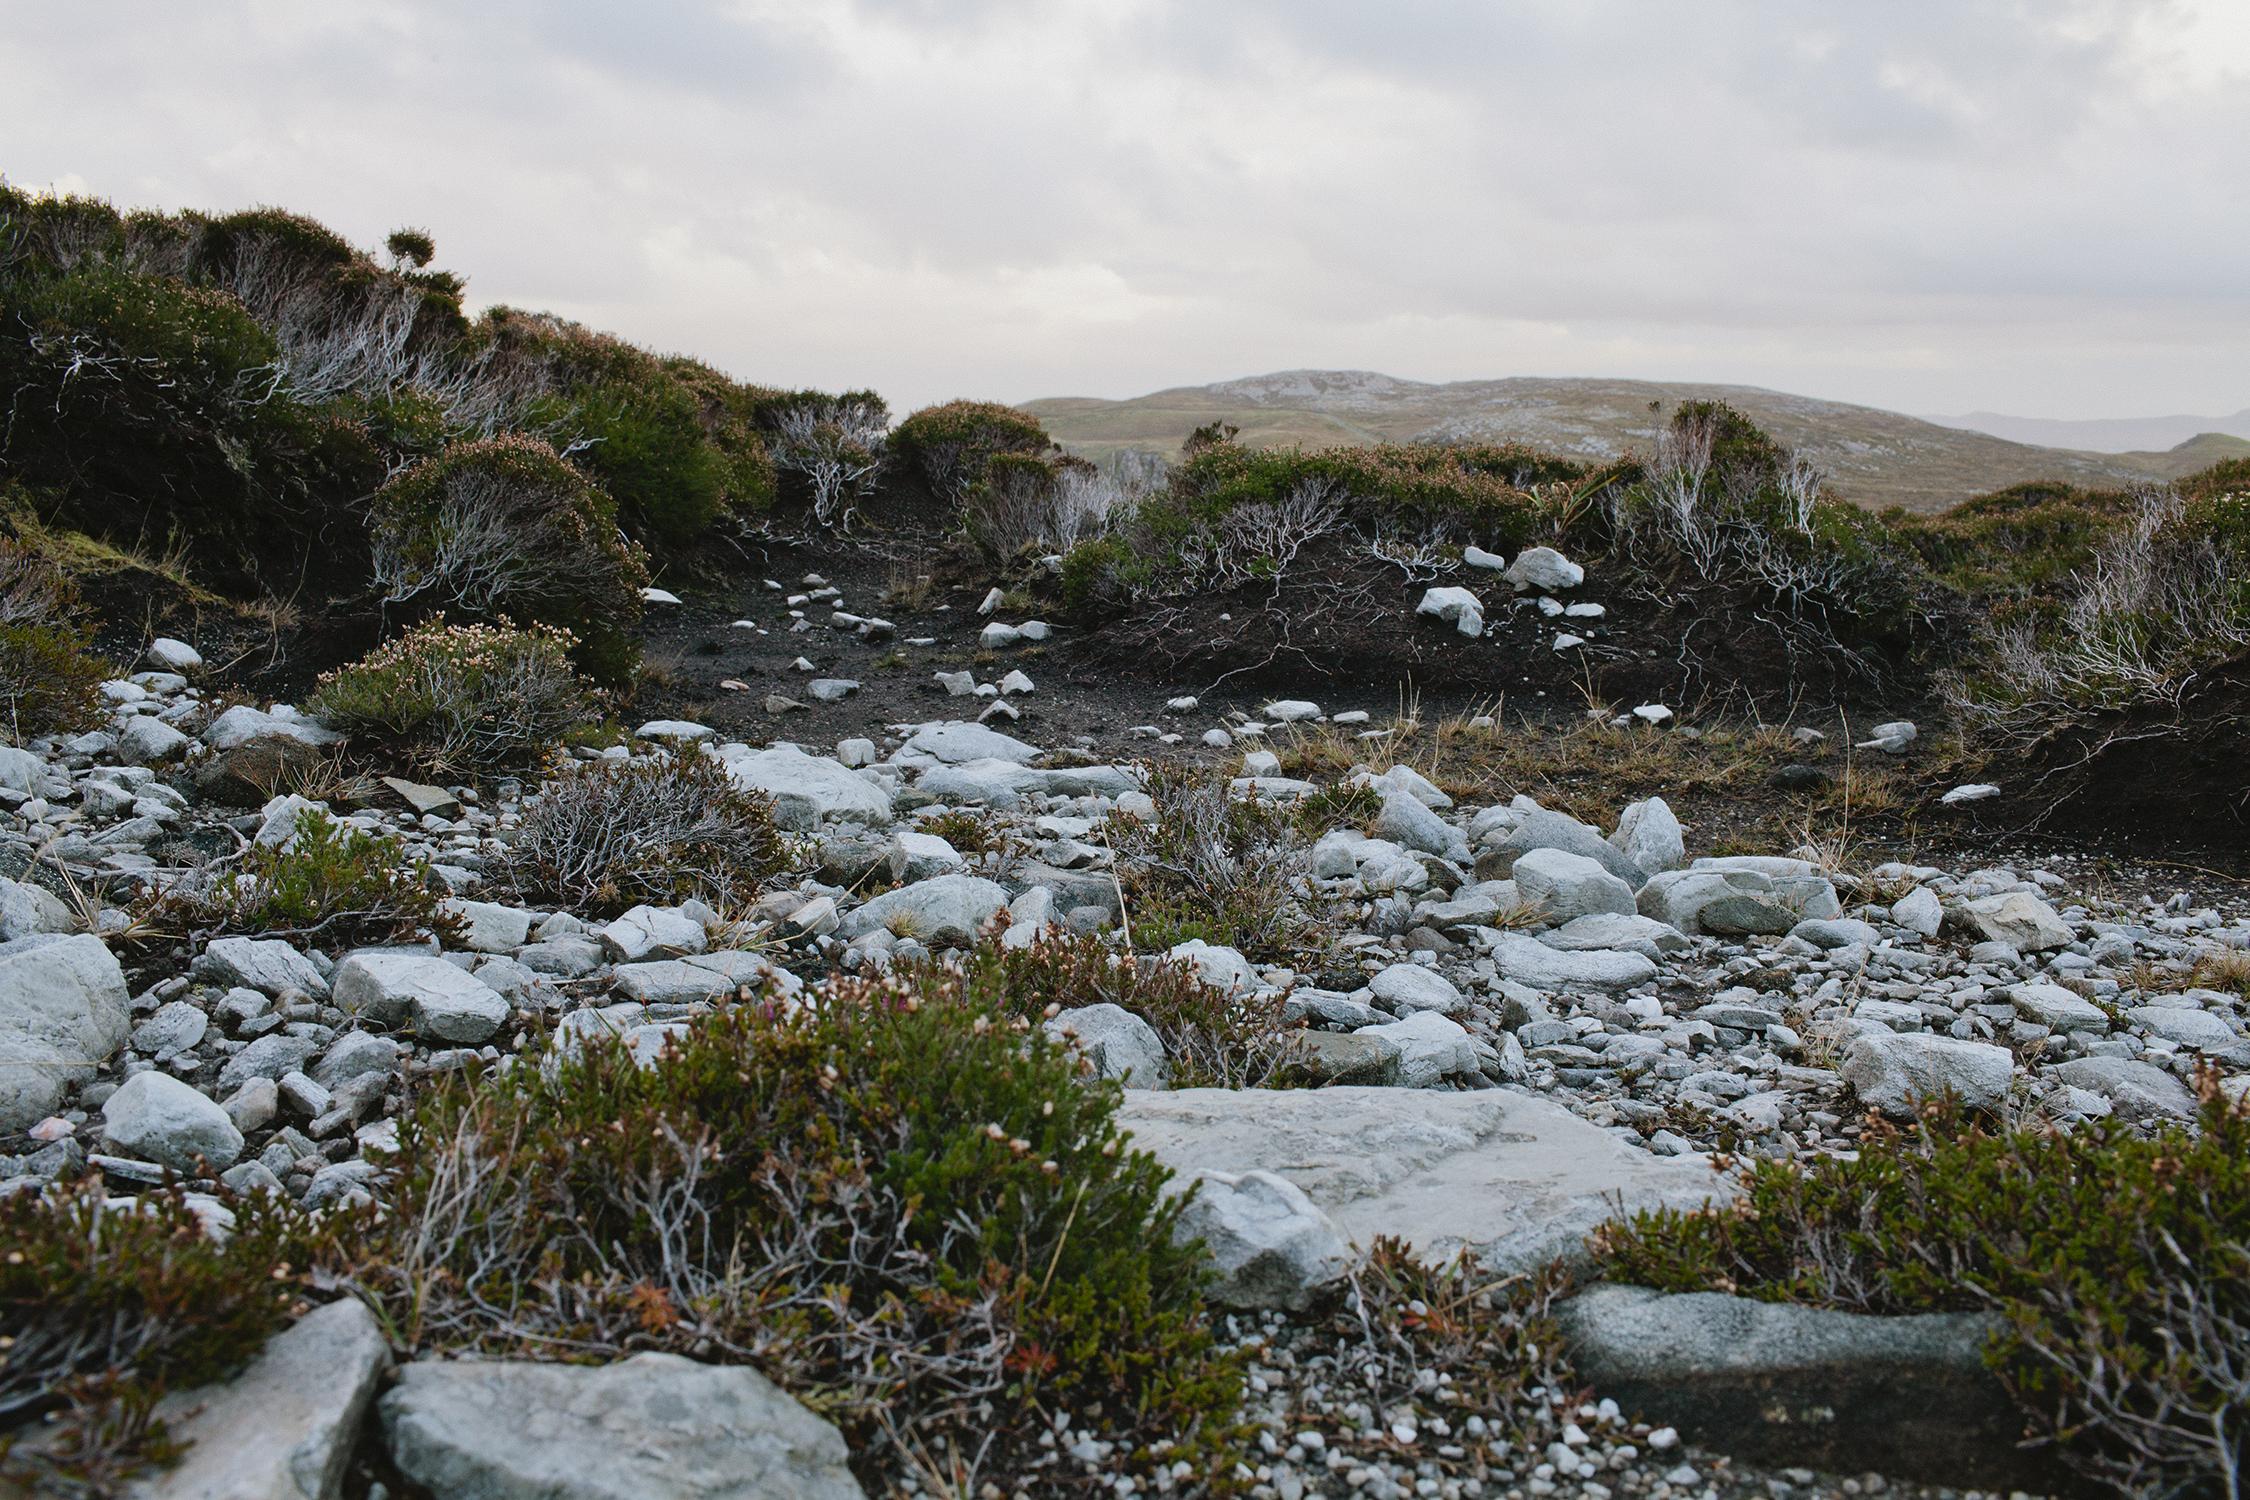 lifestyle-editorial-travel-washington-dc-malek-naz-photography-ireland-rocks.jpg